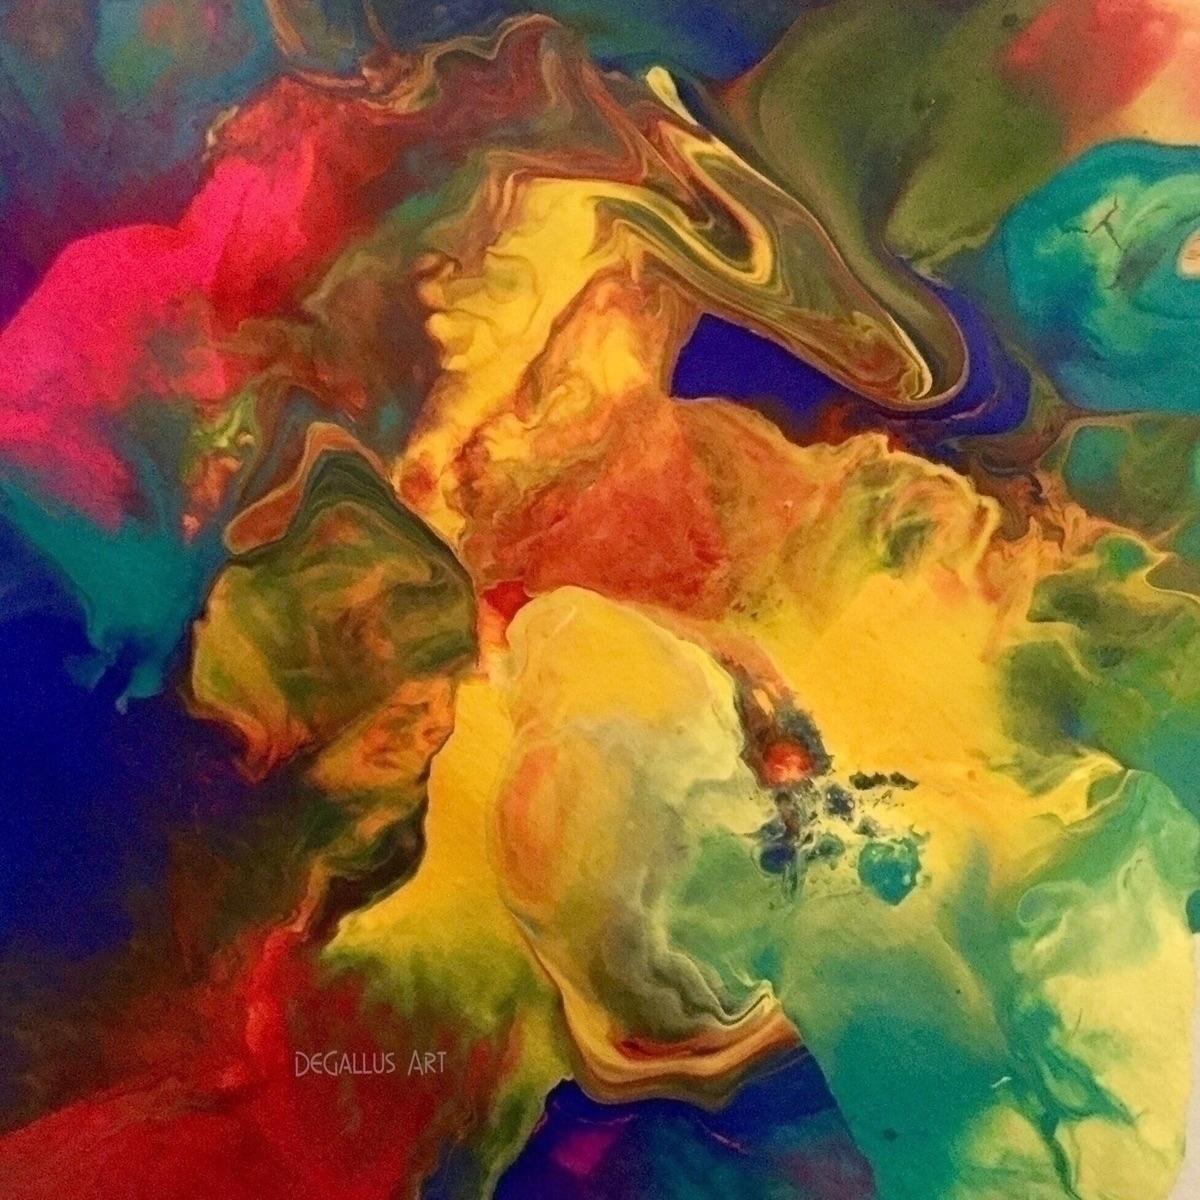 CAPRICORN NEBULA fluid painting - degallusart | ello